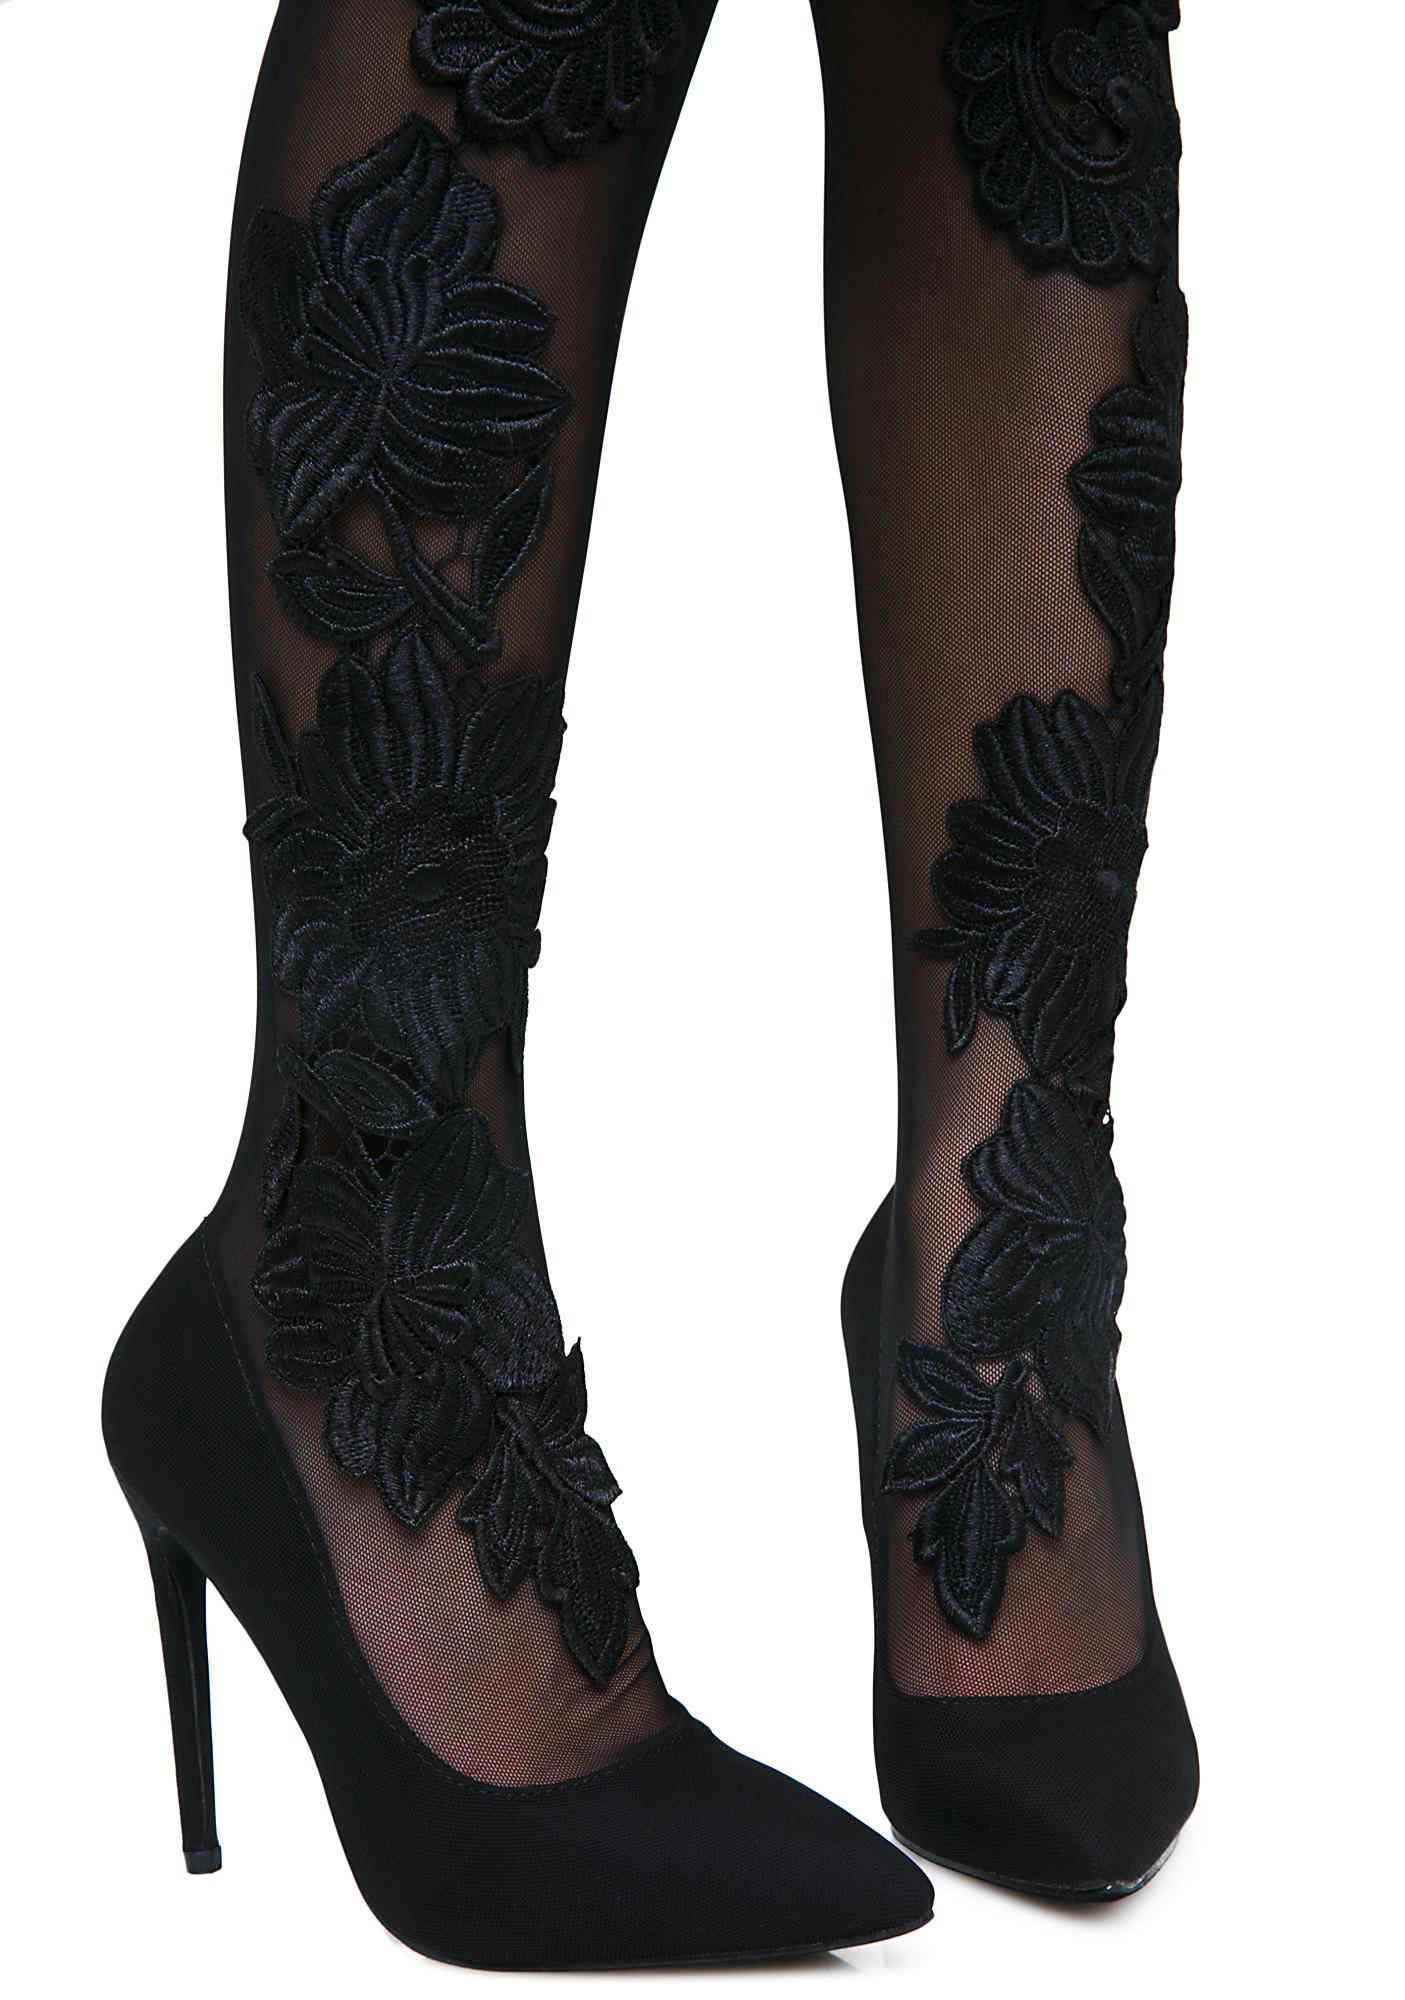 Sensual Seduction Thigh High Heels